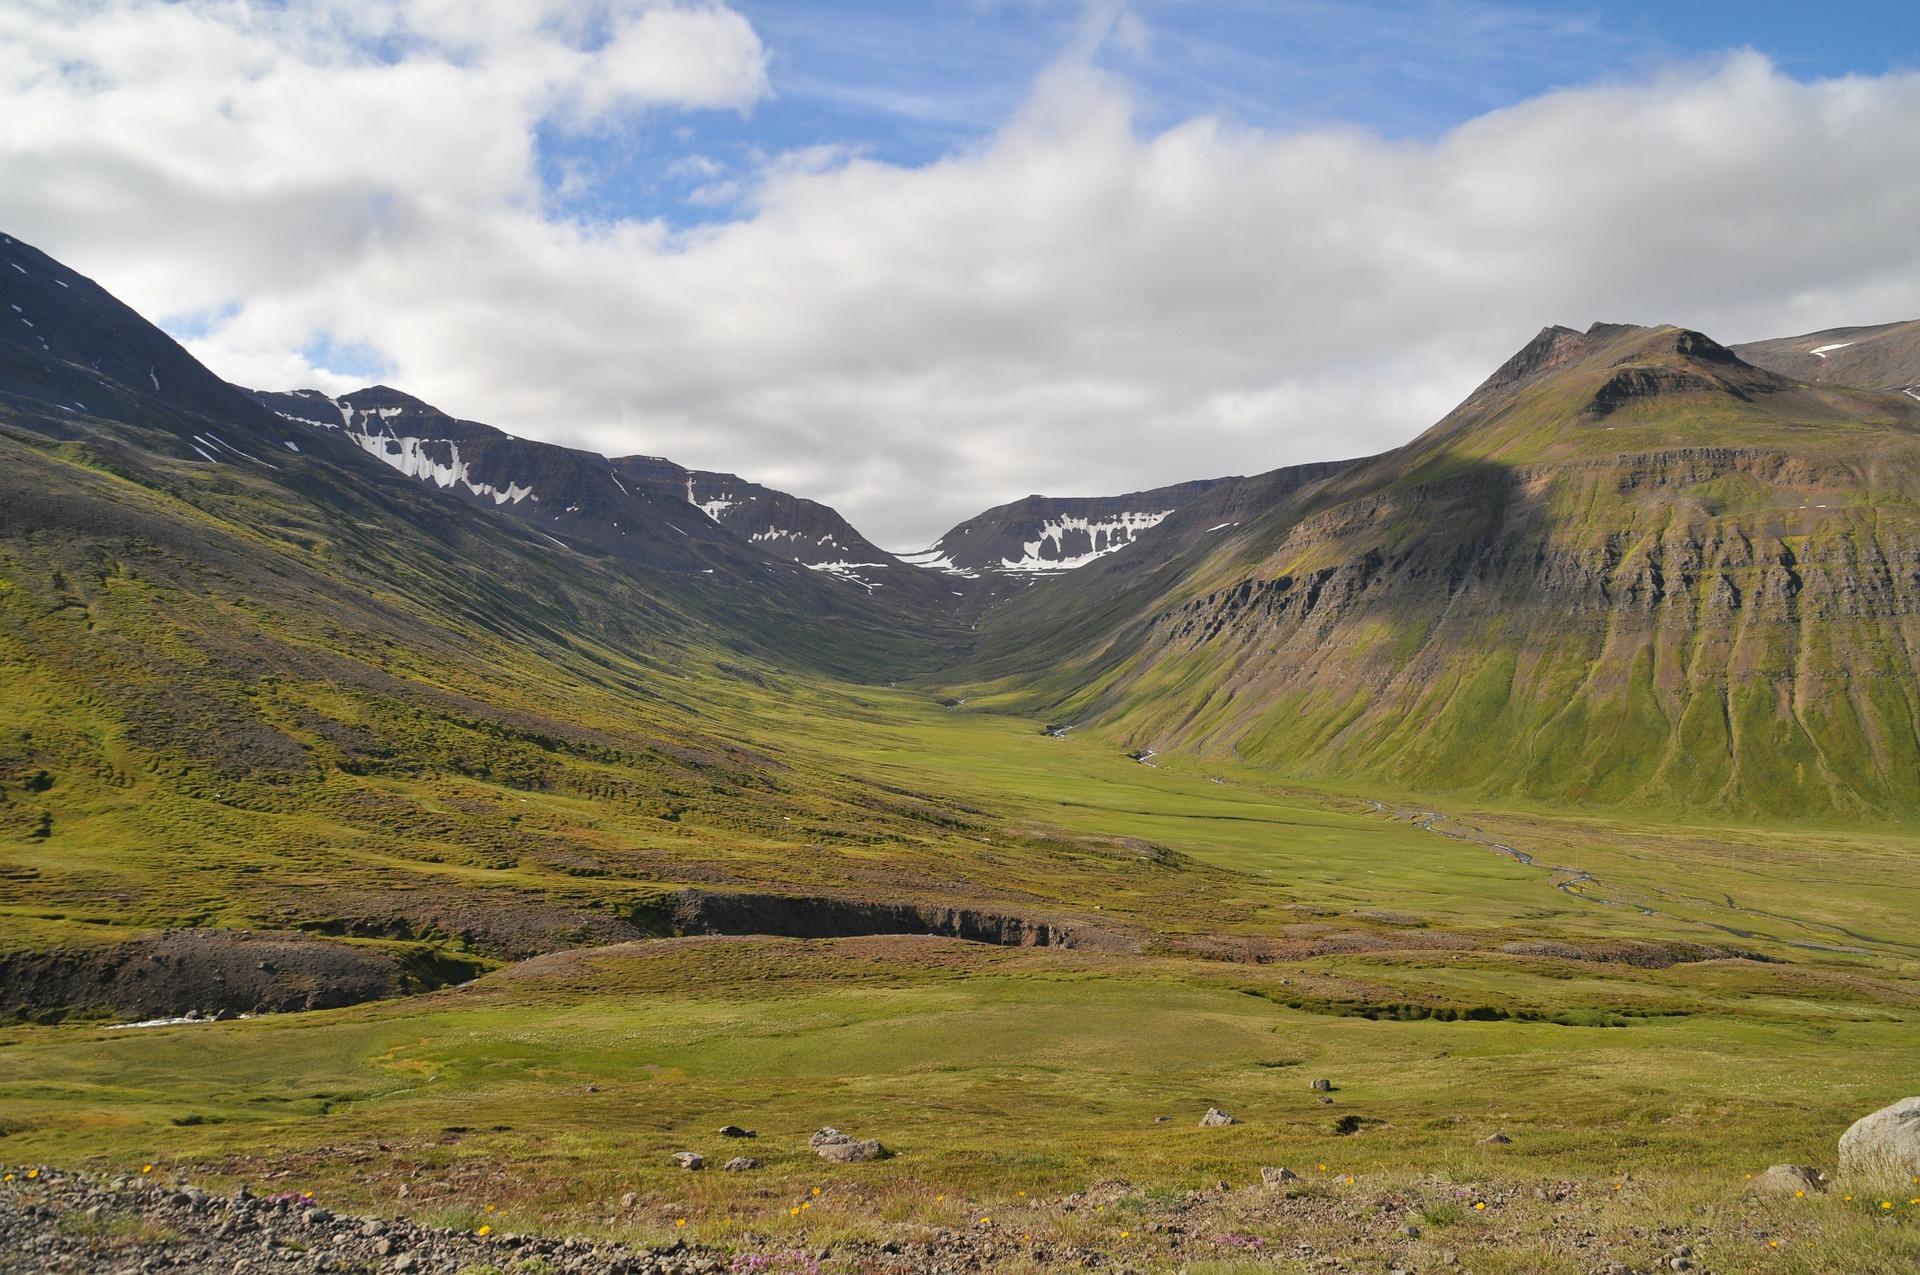 Landbótasjóður